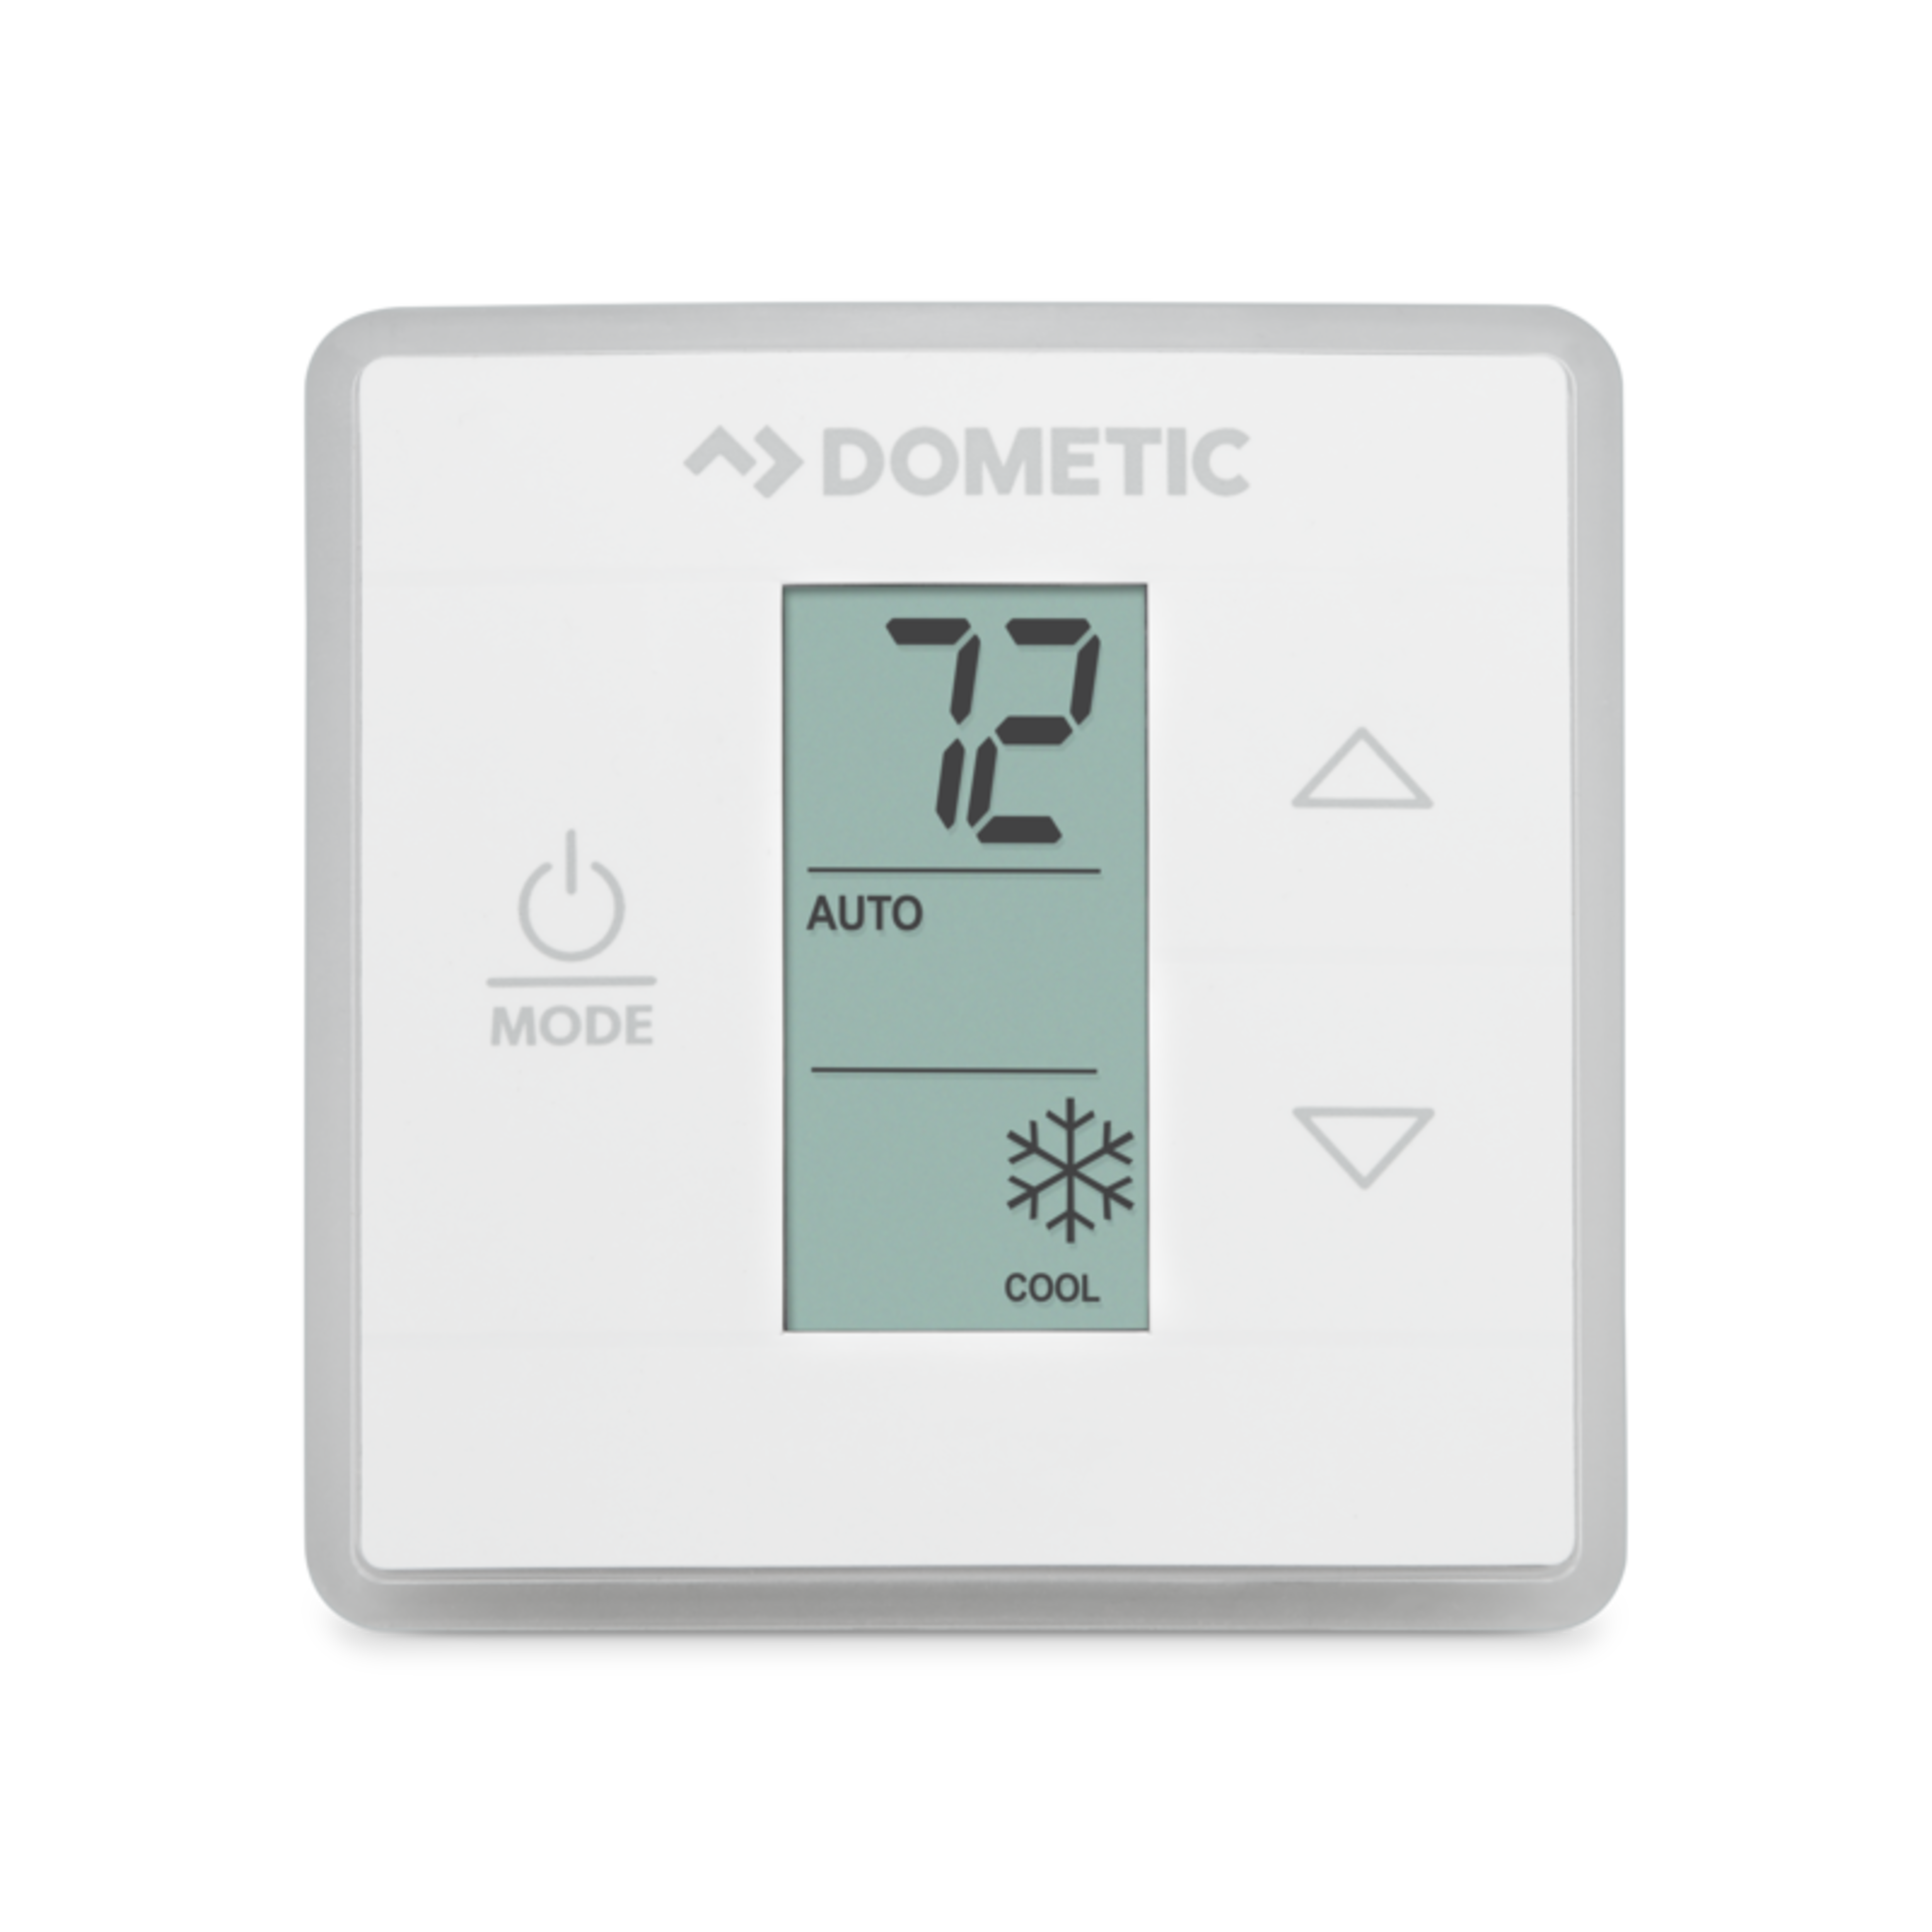 Dometic CT Single Zone Thermostat